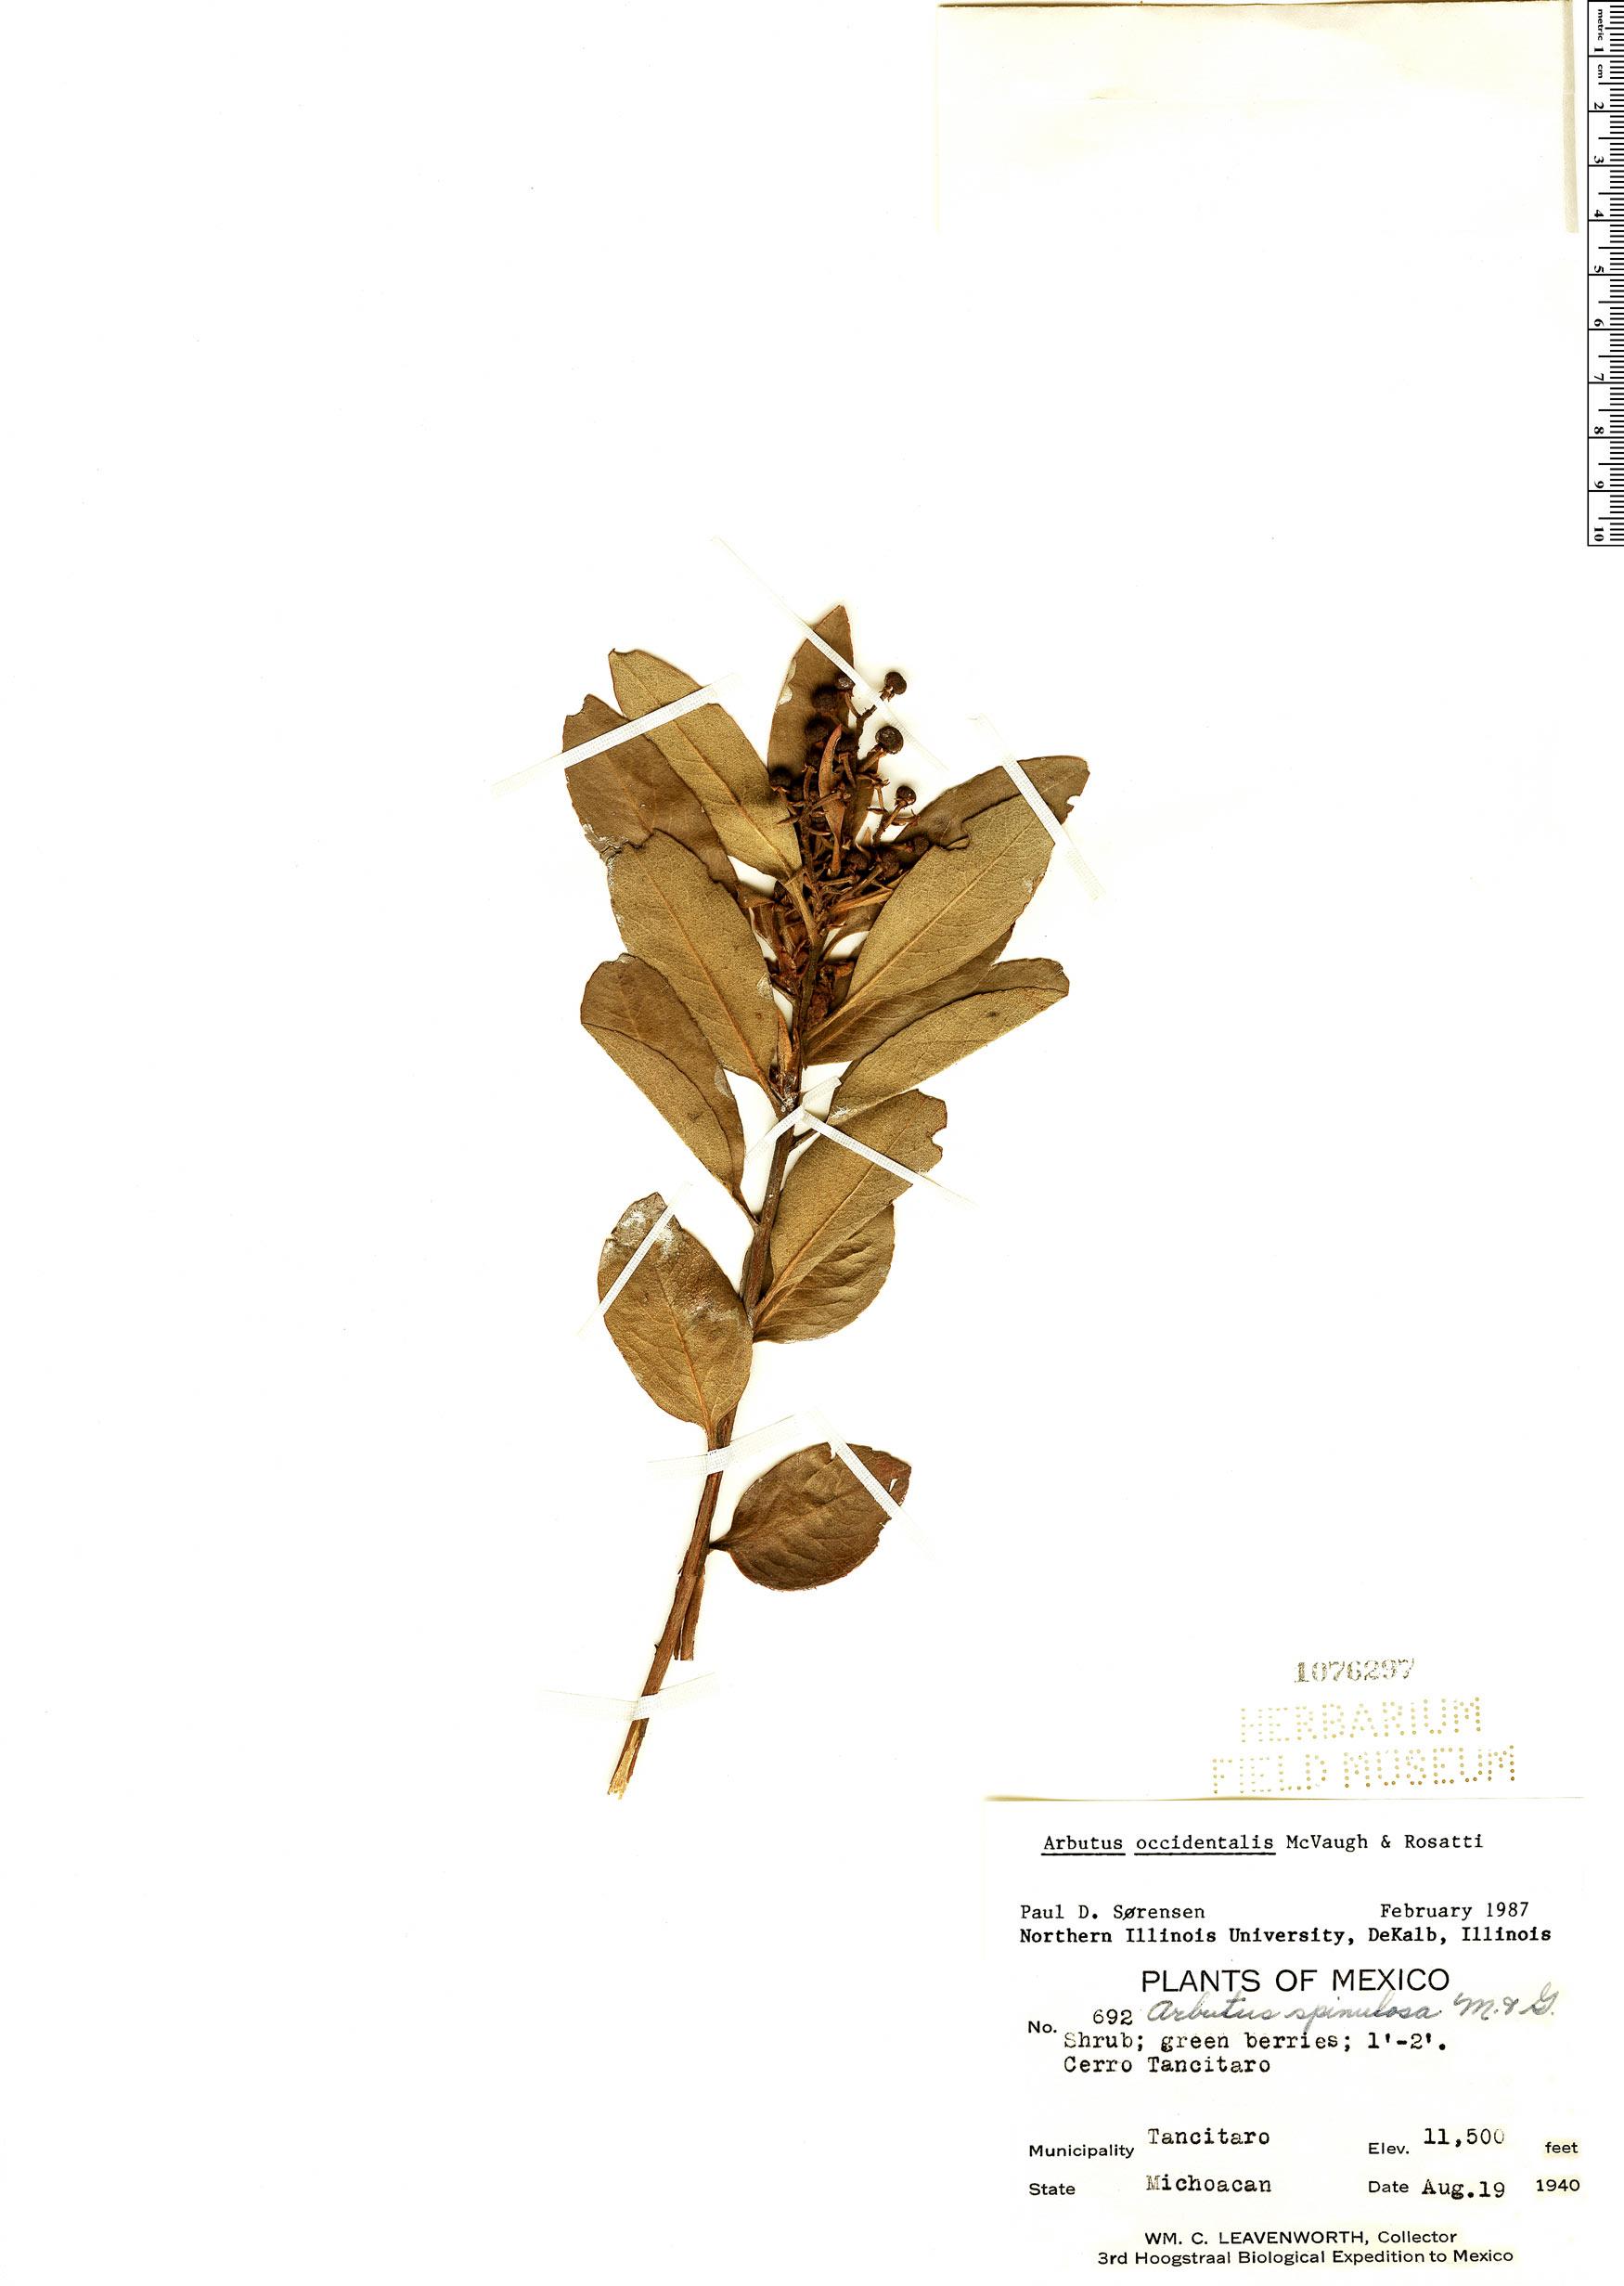 Arbutus occidentalis image